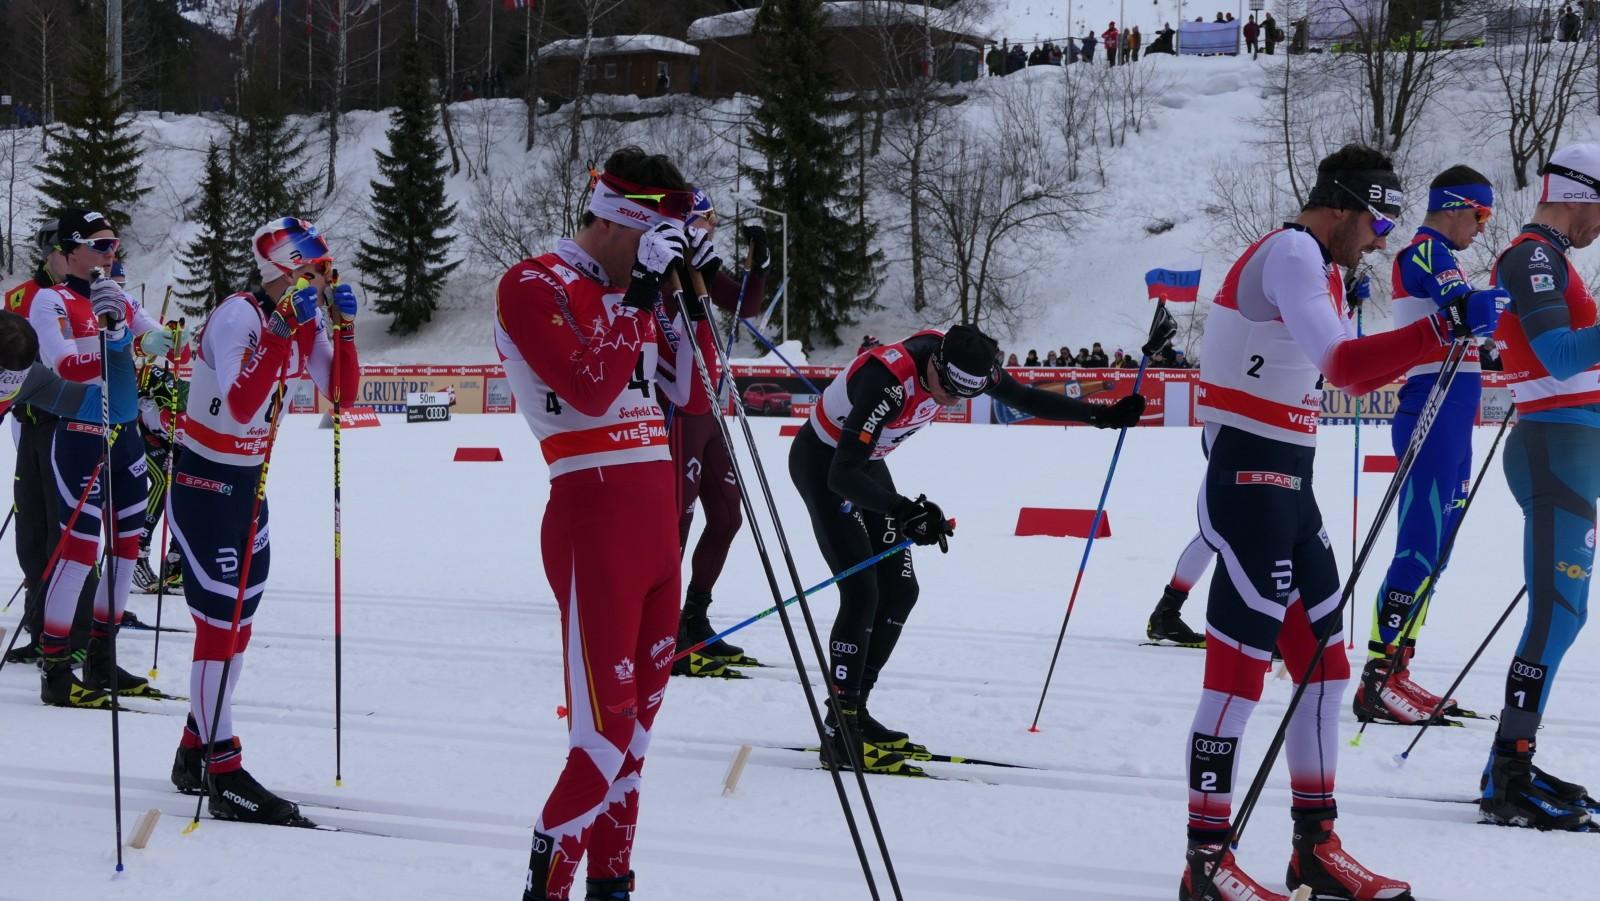 Who Is Running In Men's Skiathlon At Olympics